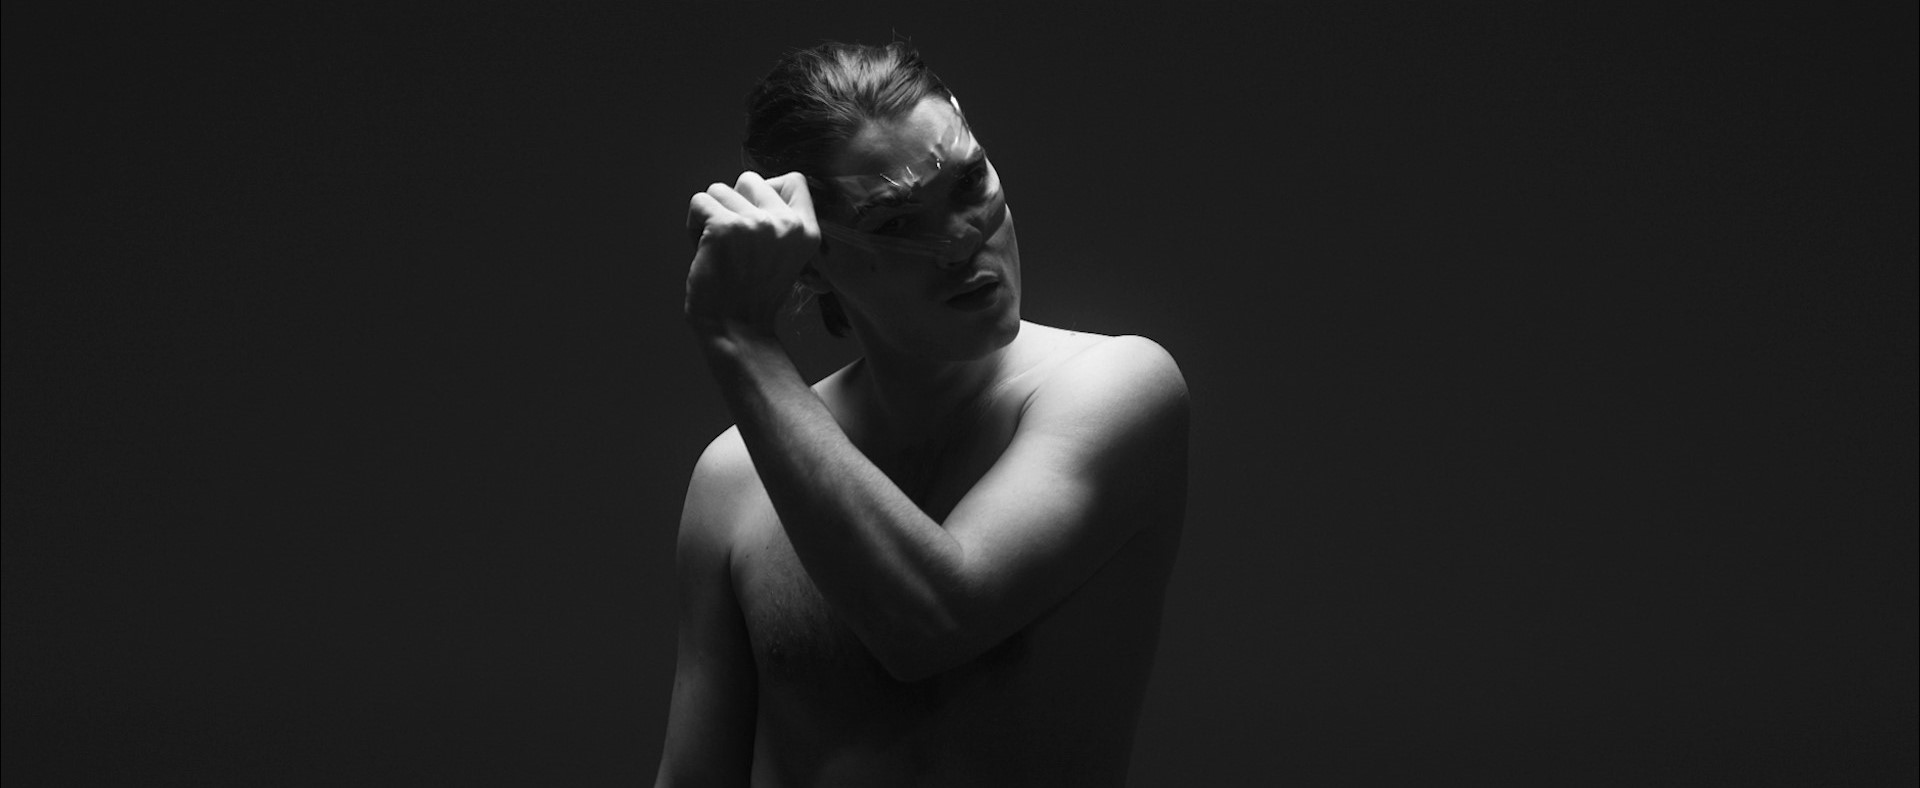 BLAZER - Eric 1